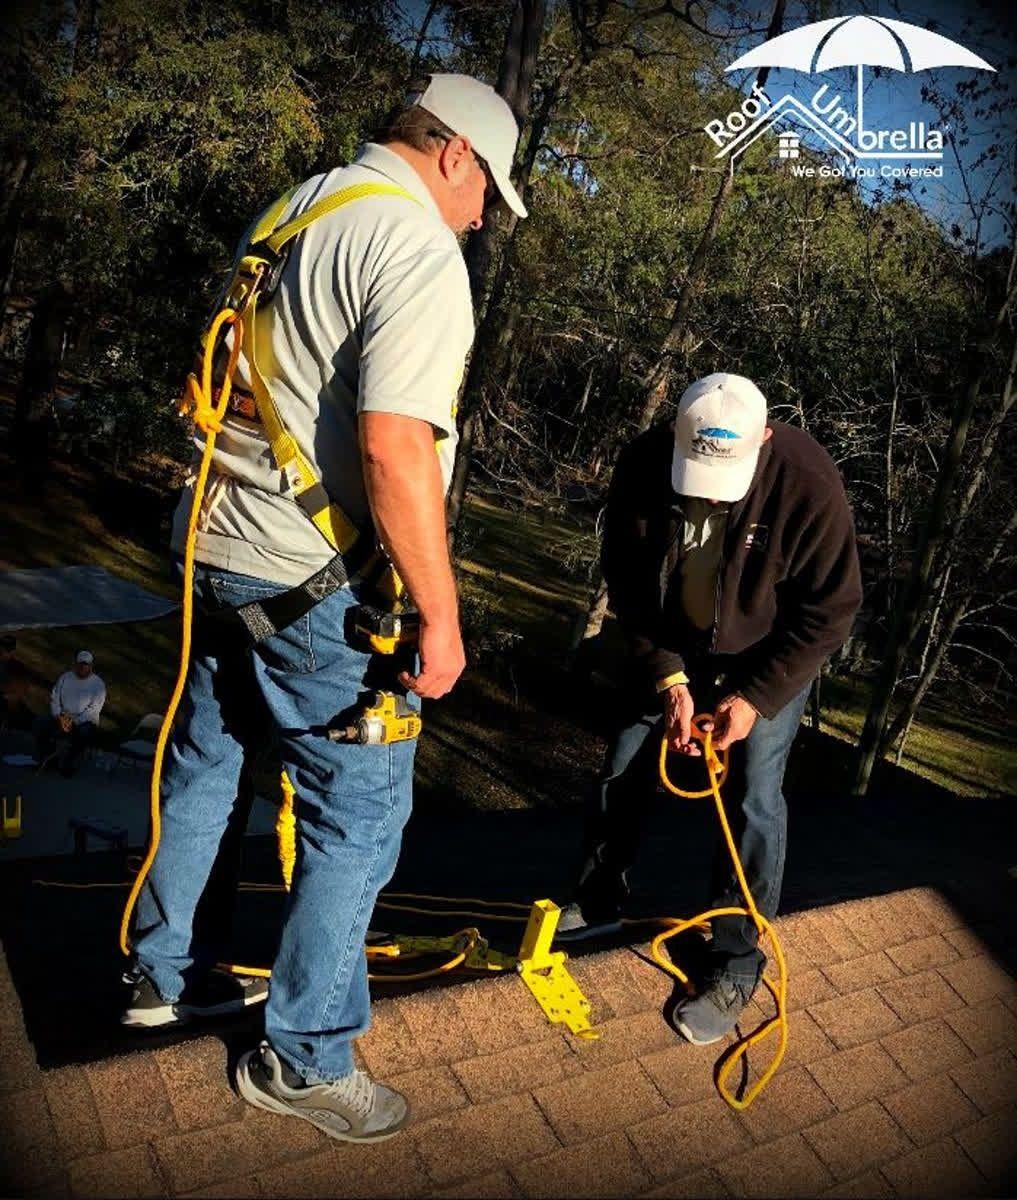 Ensure full OSHA compliance with RoofUmbrella's built in